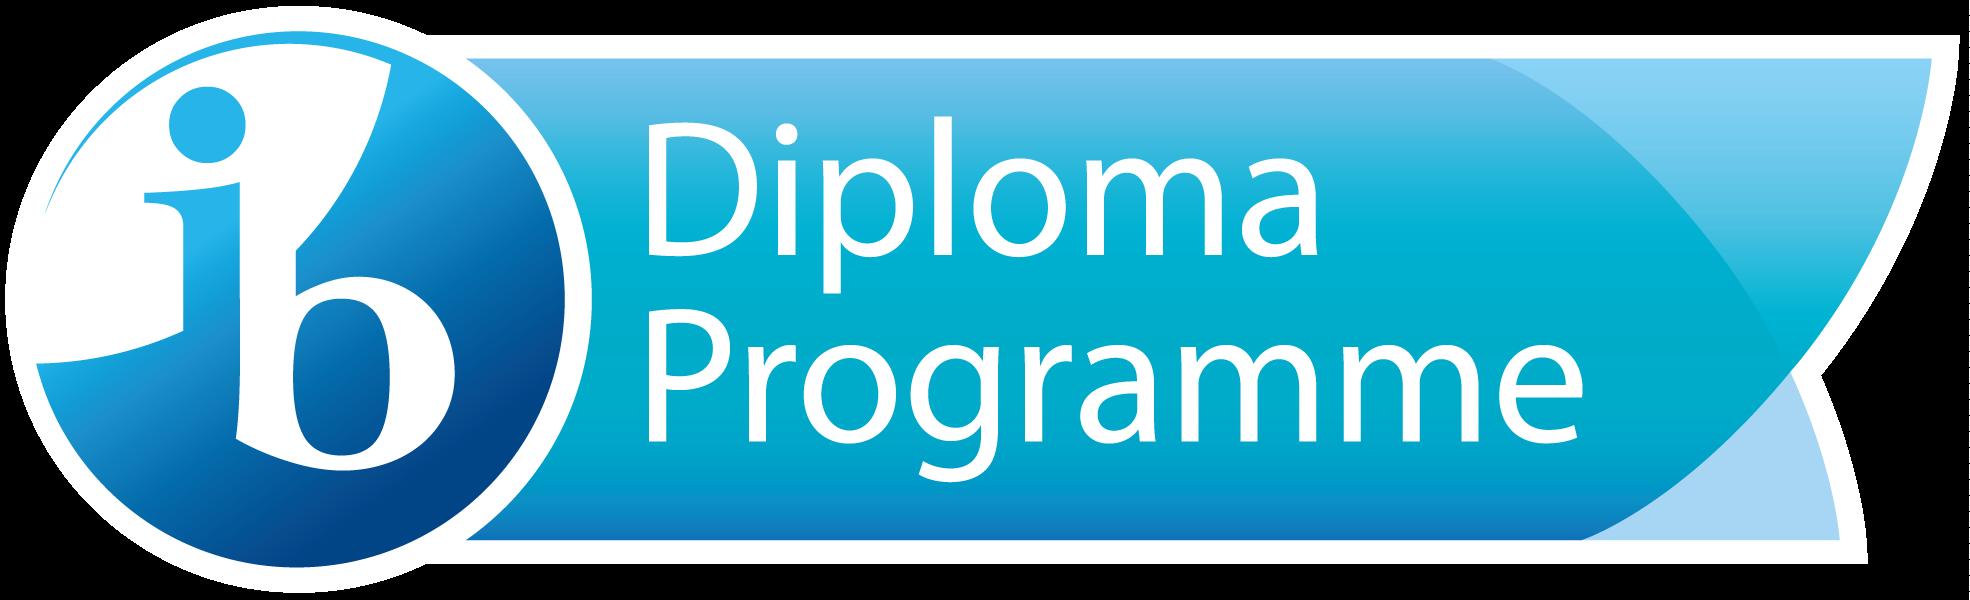 Logos and programme models. Diploma clipart programs